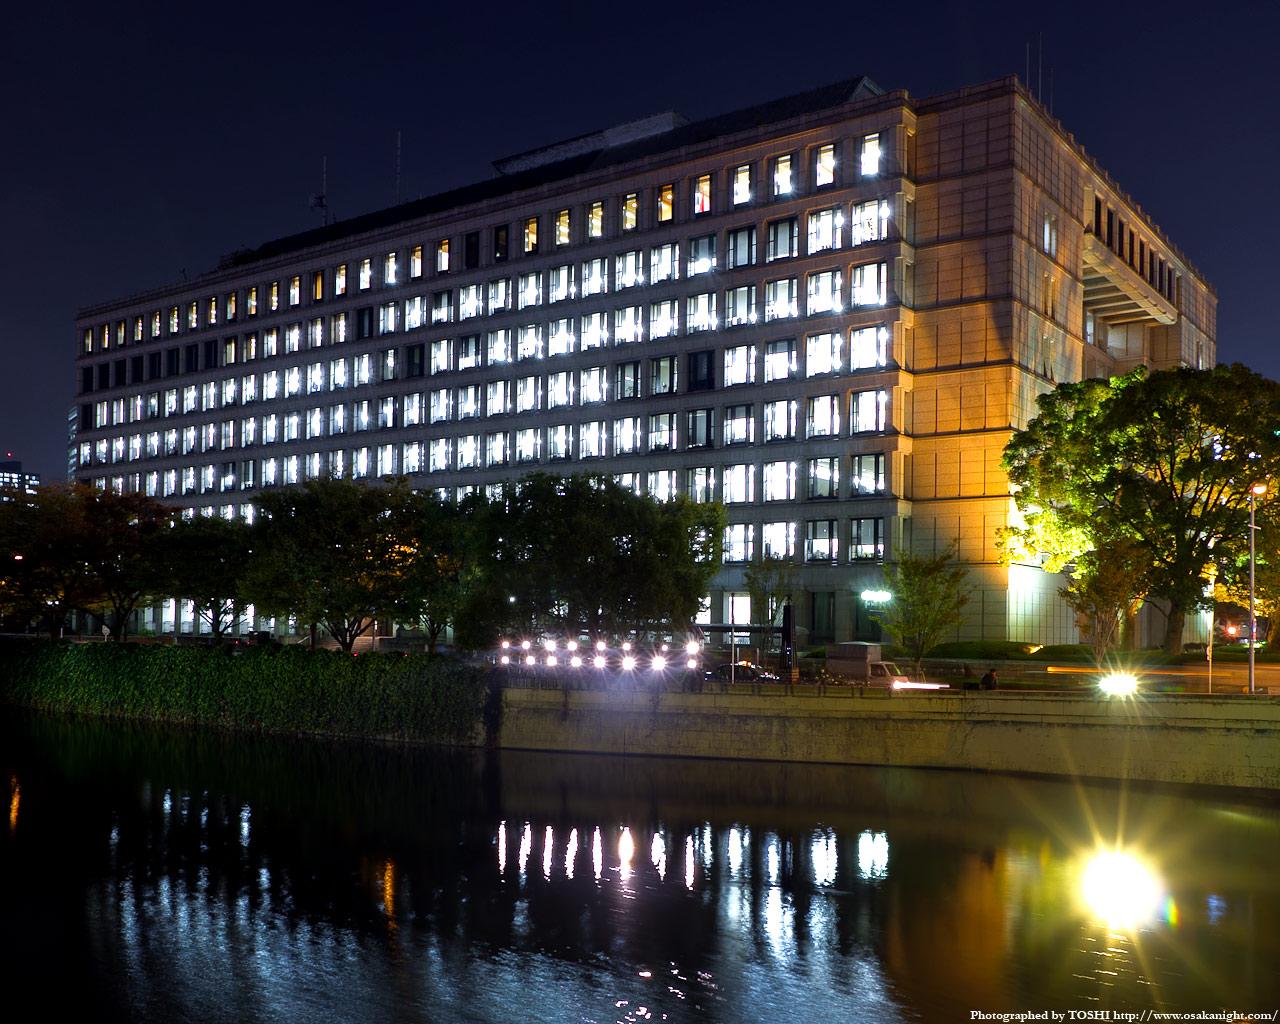 大阪市役所の夜景4